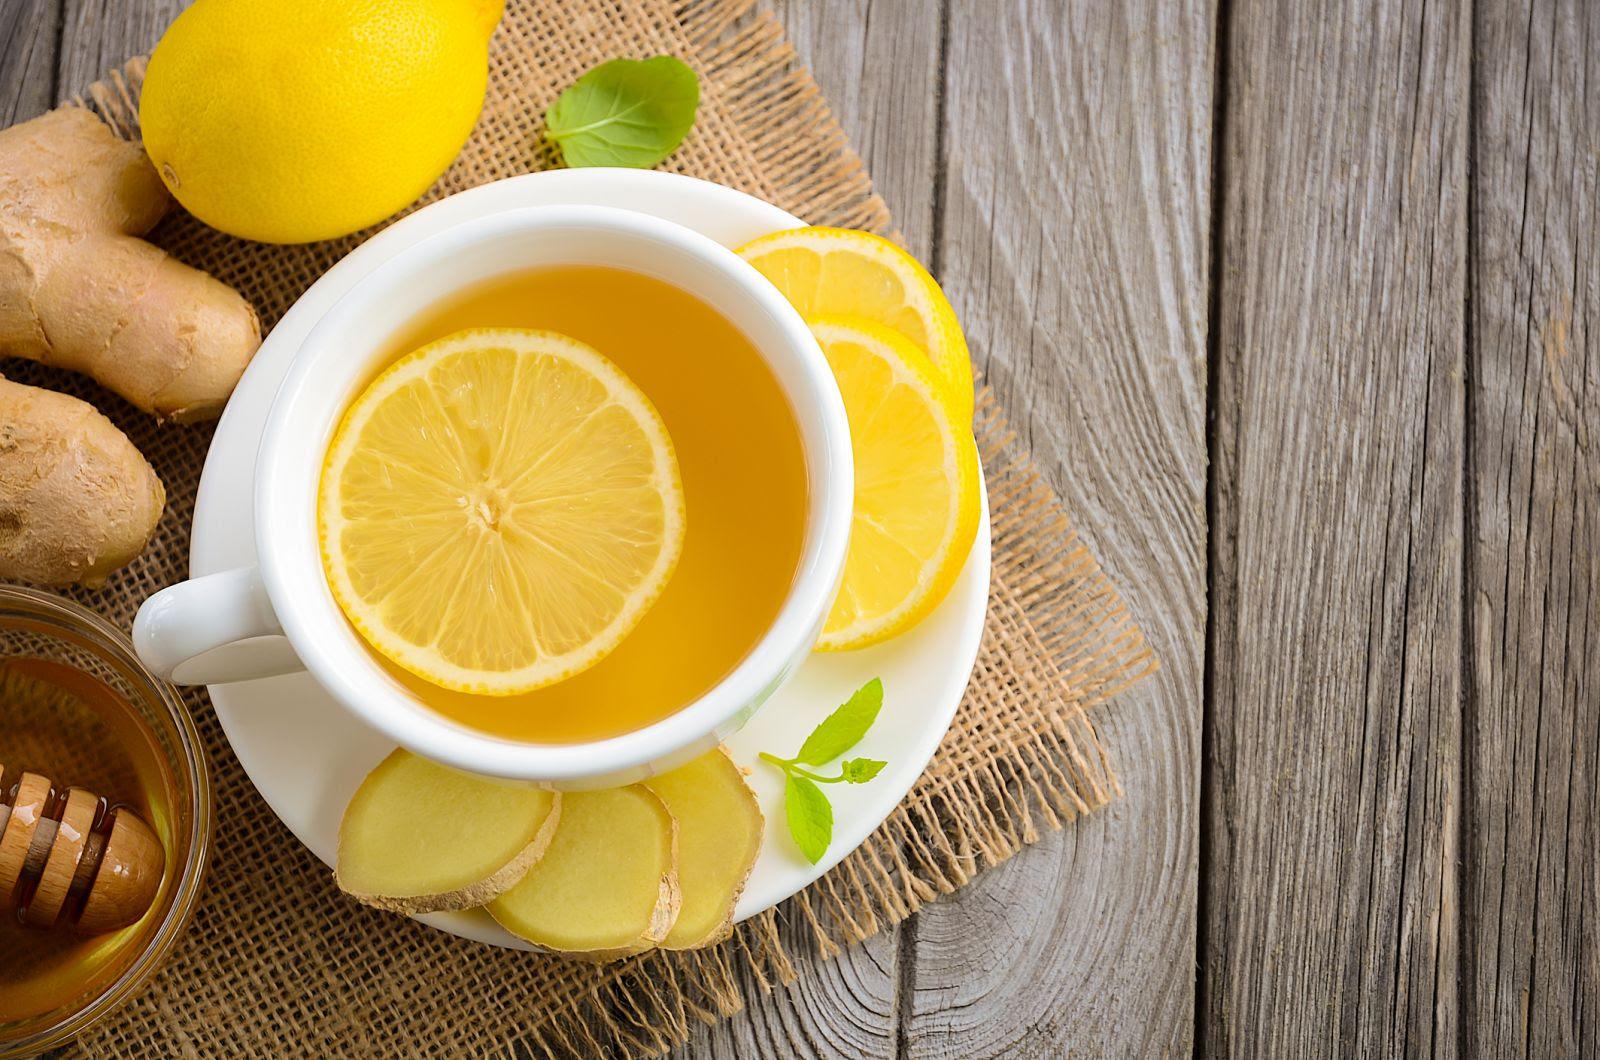 Herbal remedies for heartburn